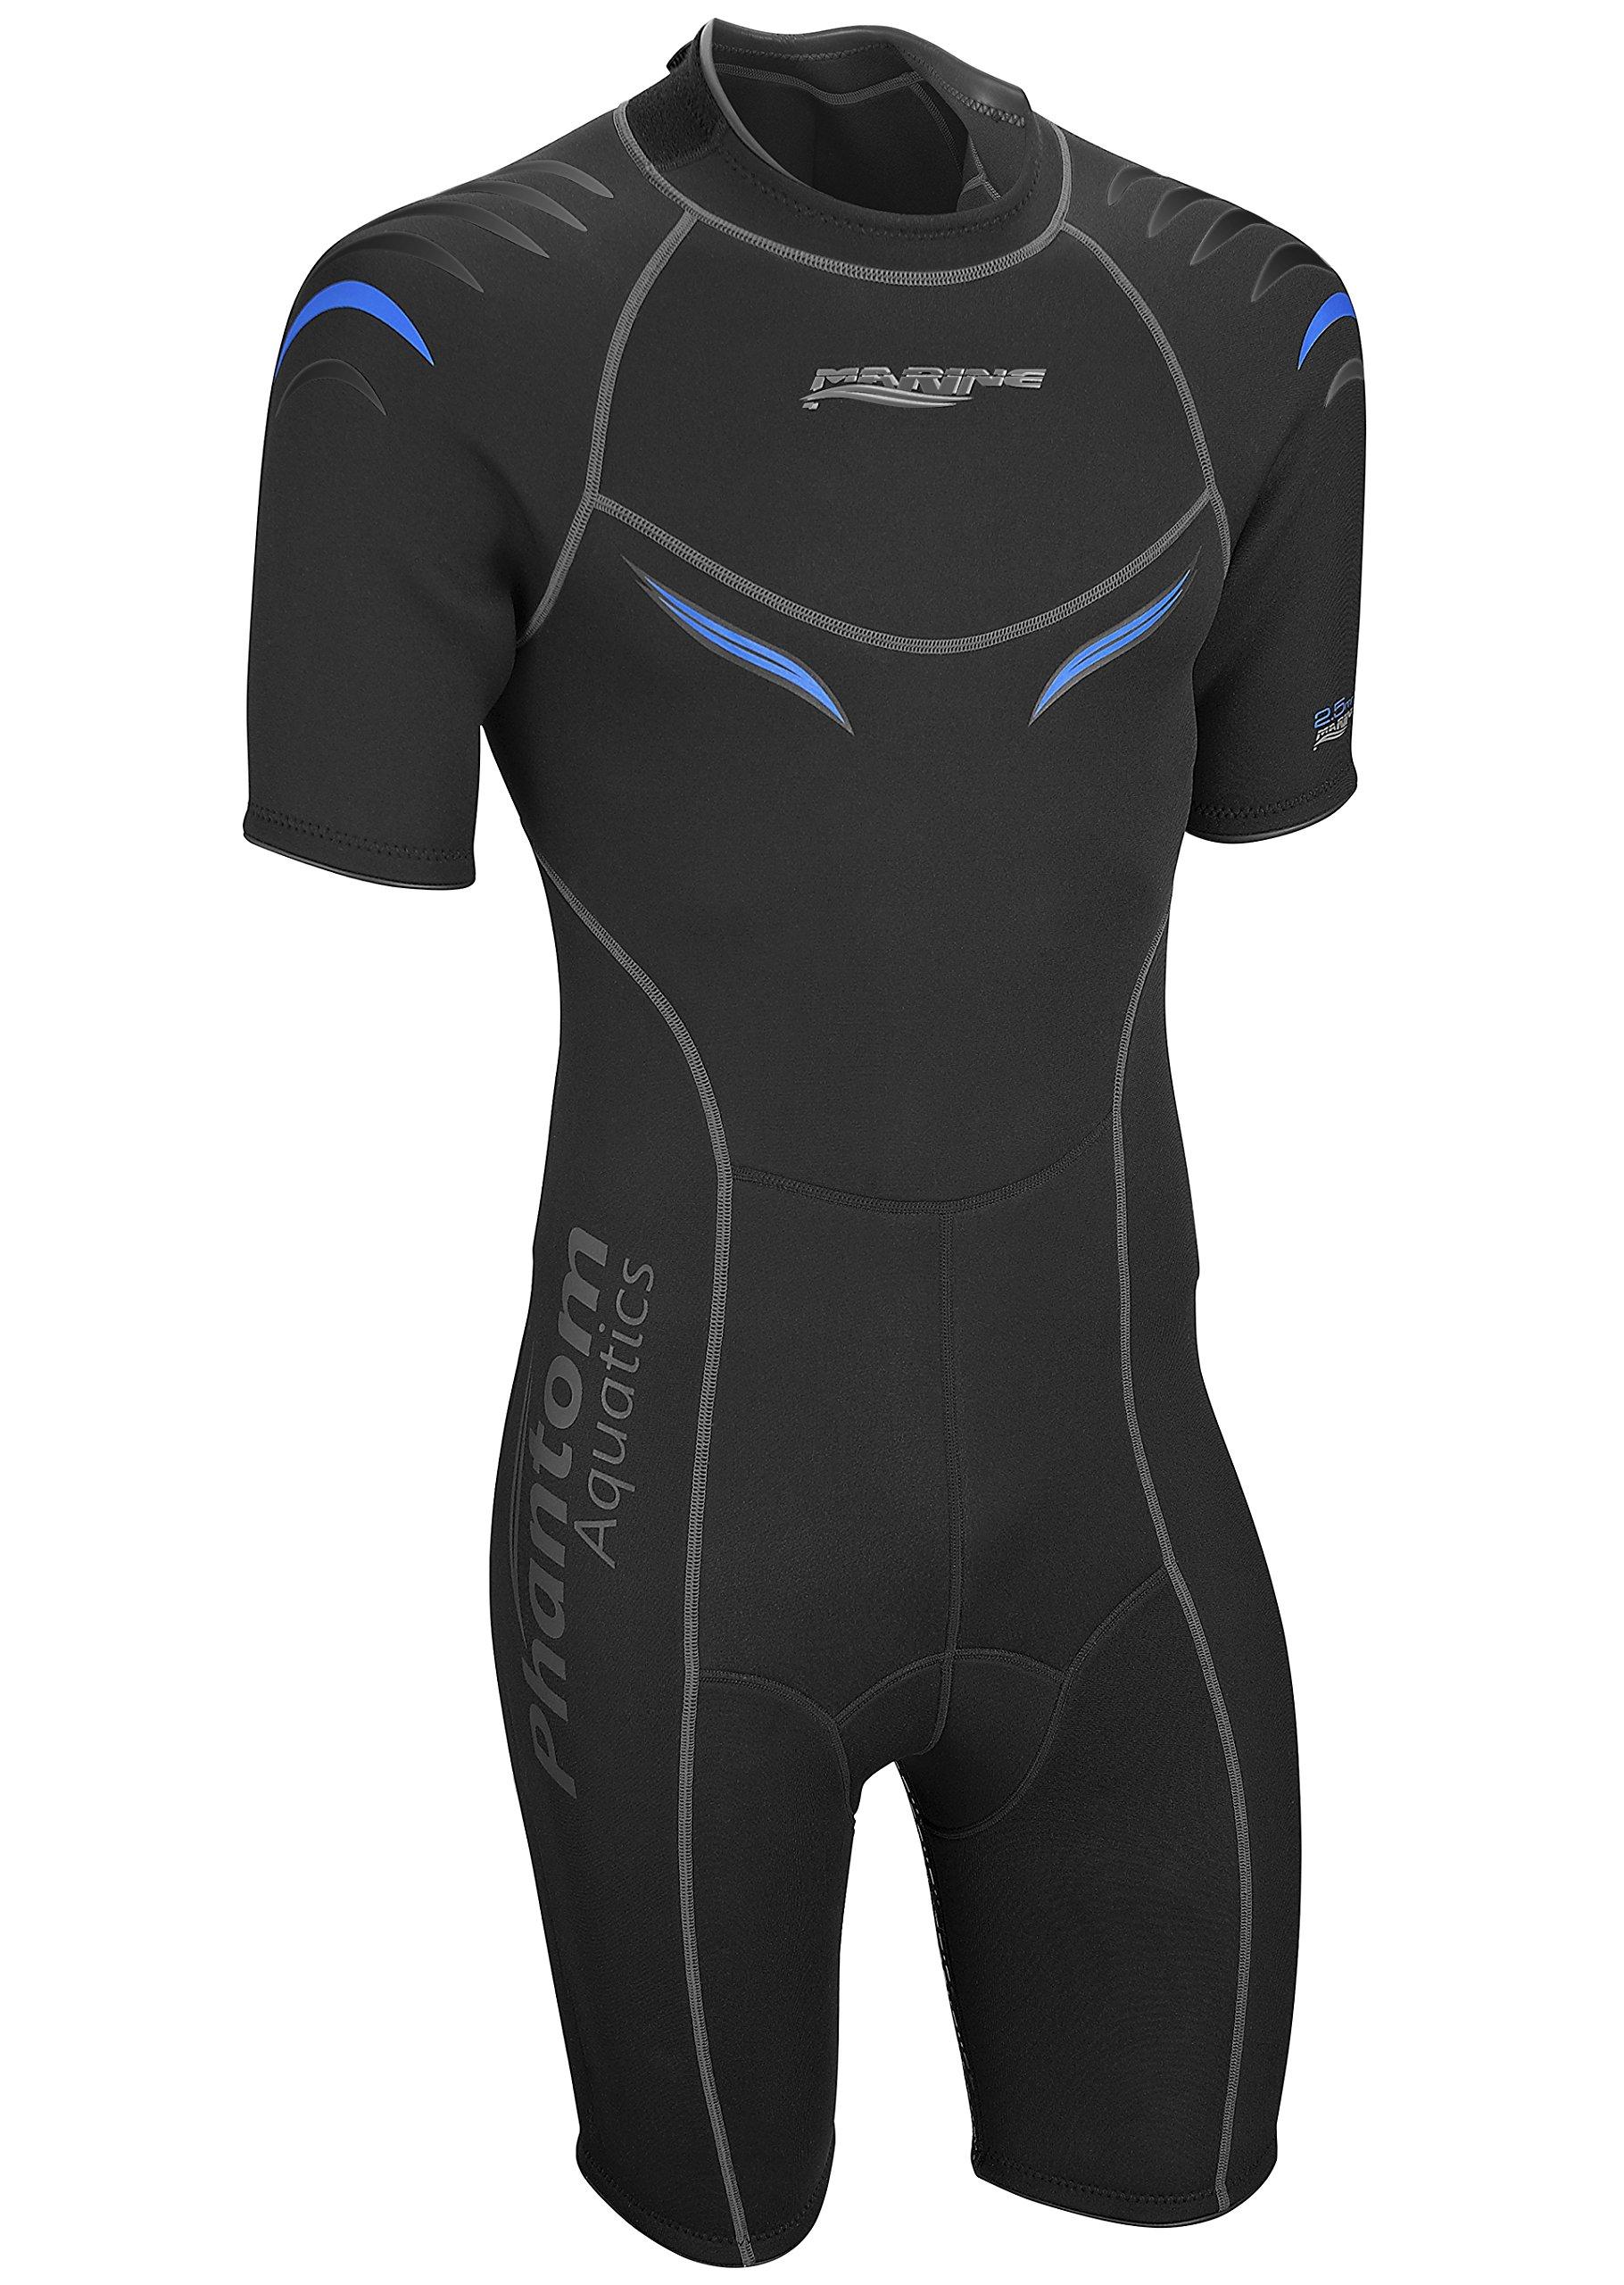 Phantom Aquatics Marine Men's Shorty Wetsuit, Black Blue - Medium